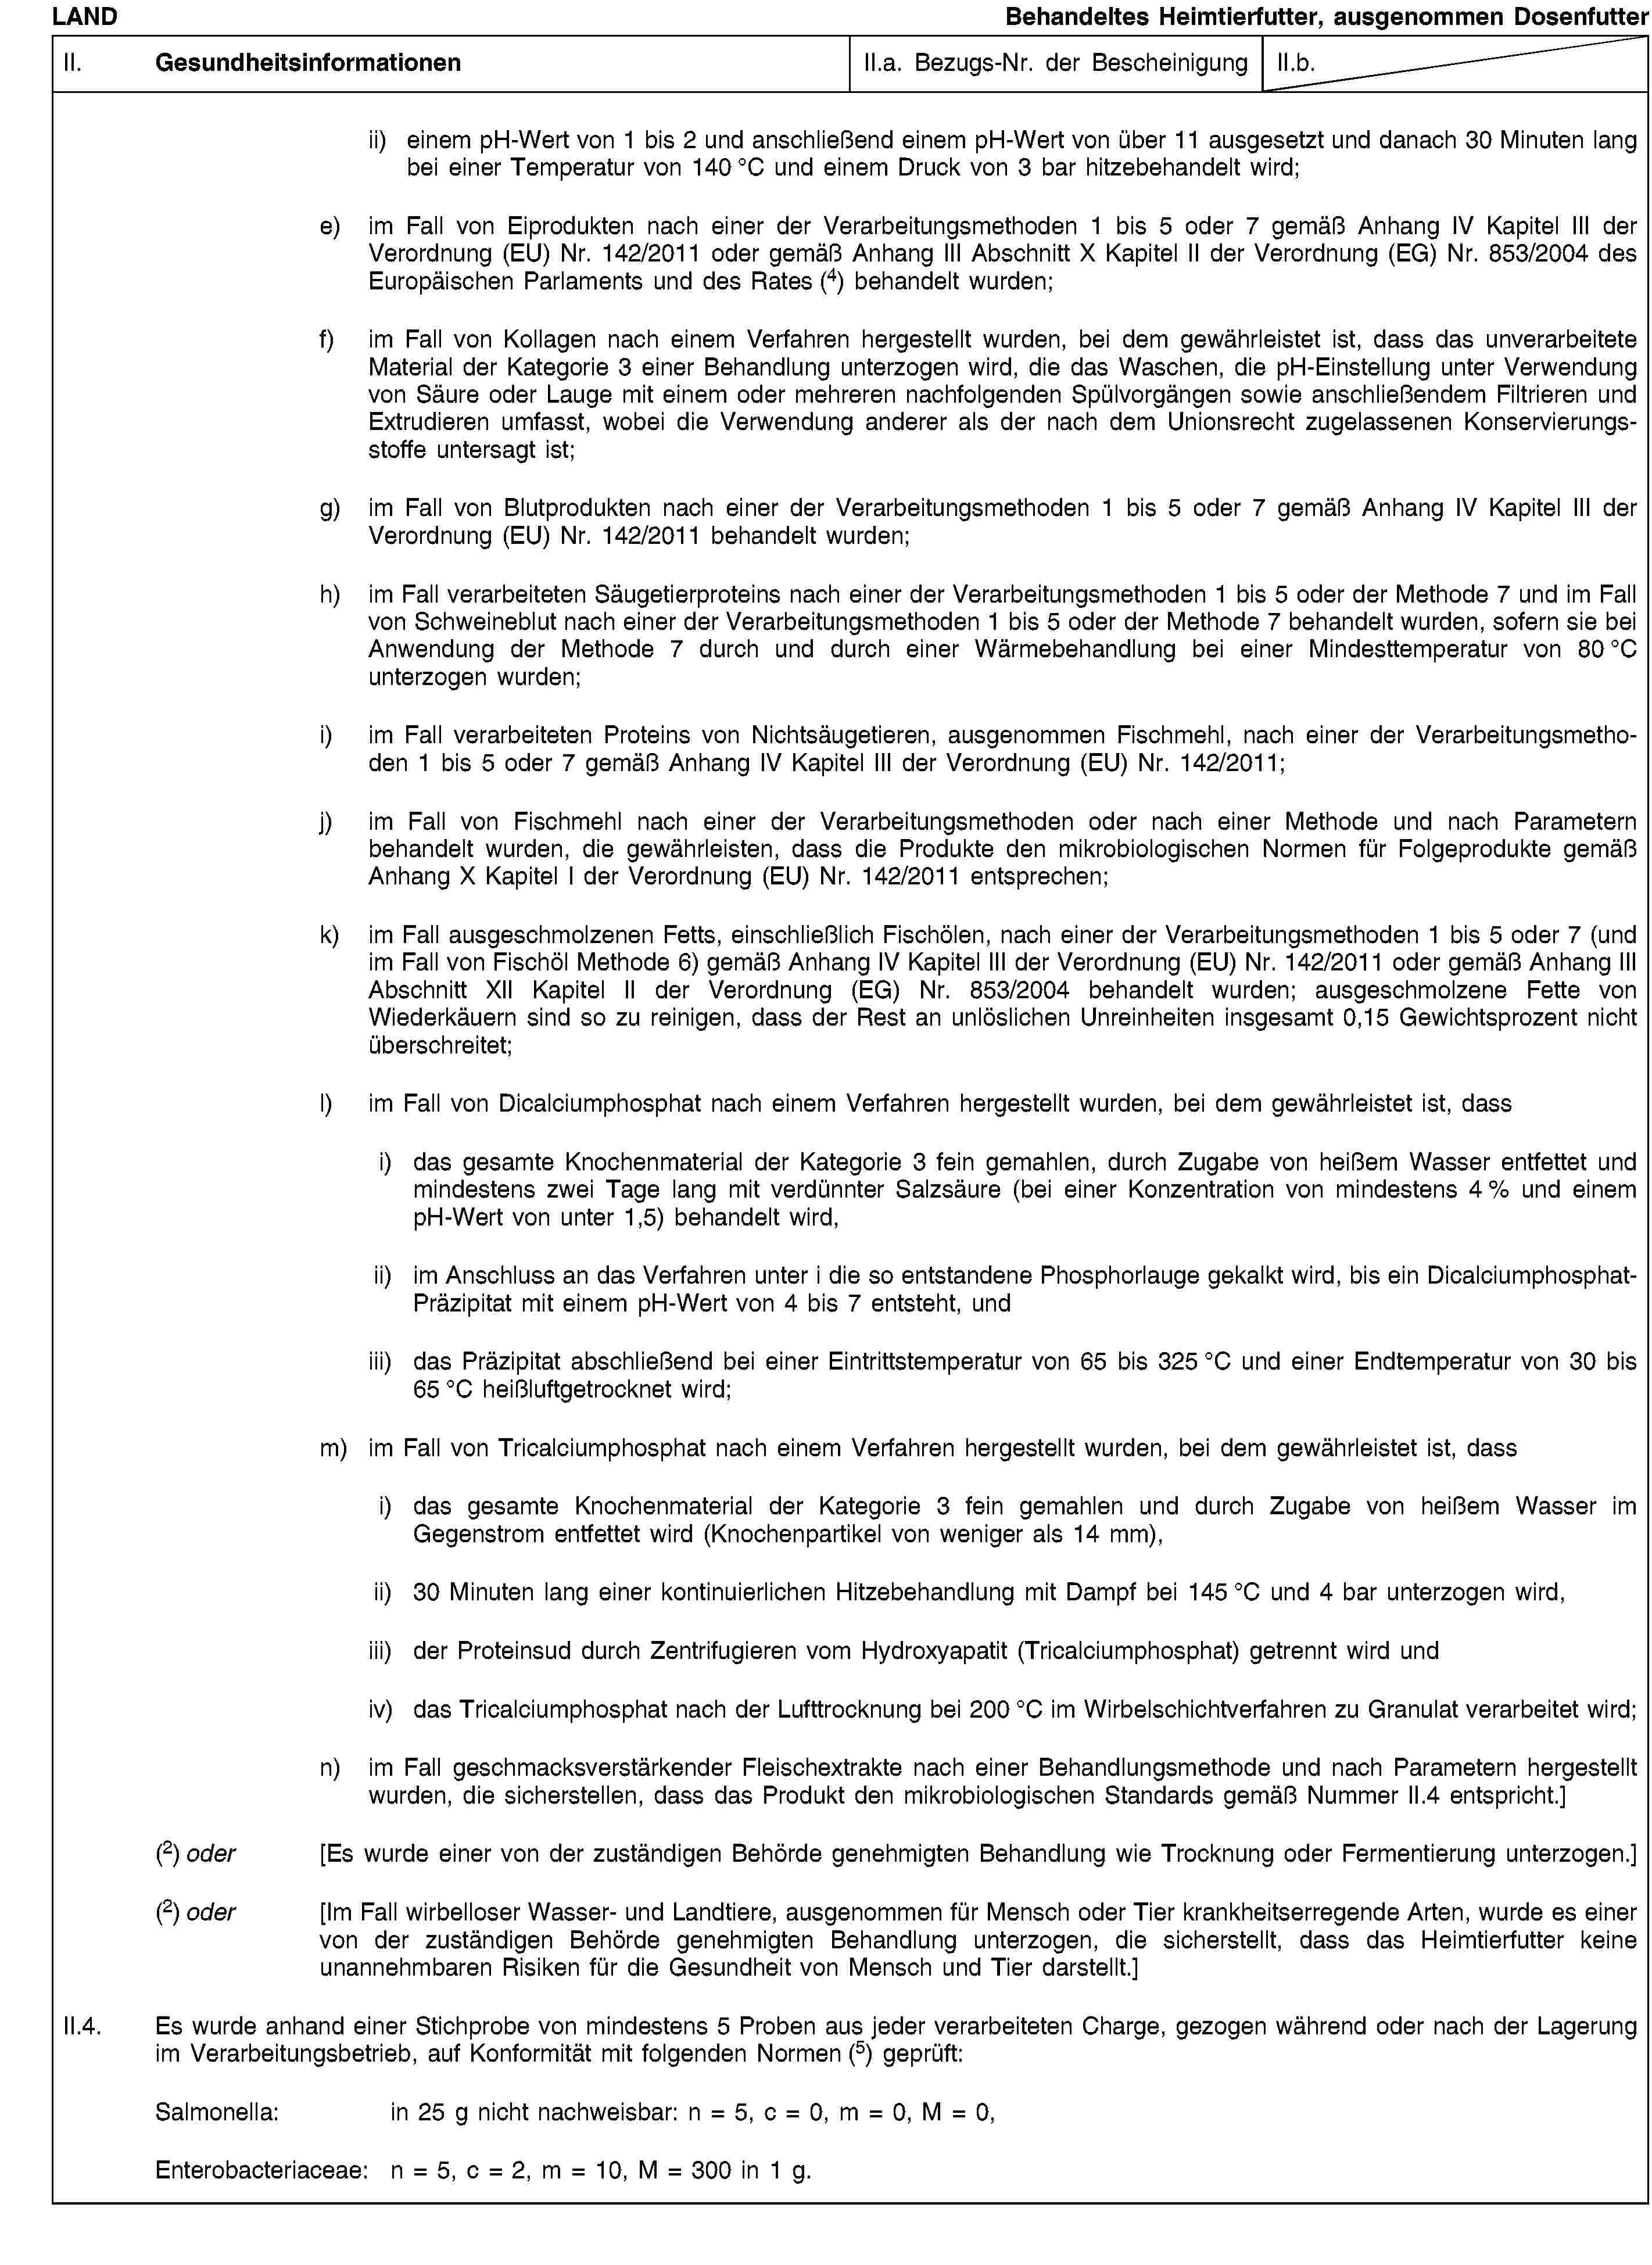 EUR-Lex - 02011R0142-20140319 - EN - EUR-Lex